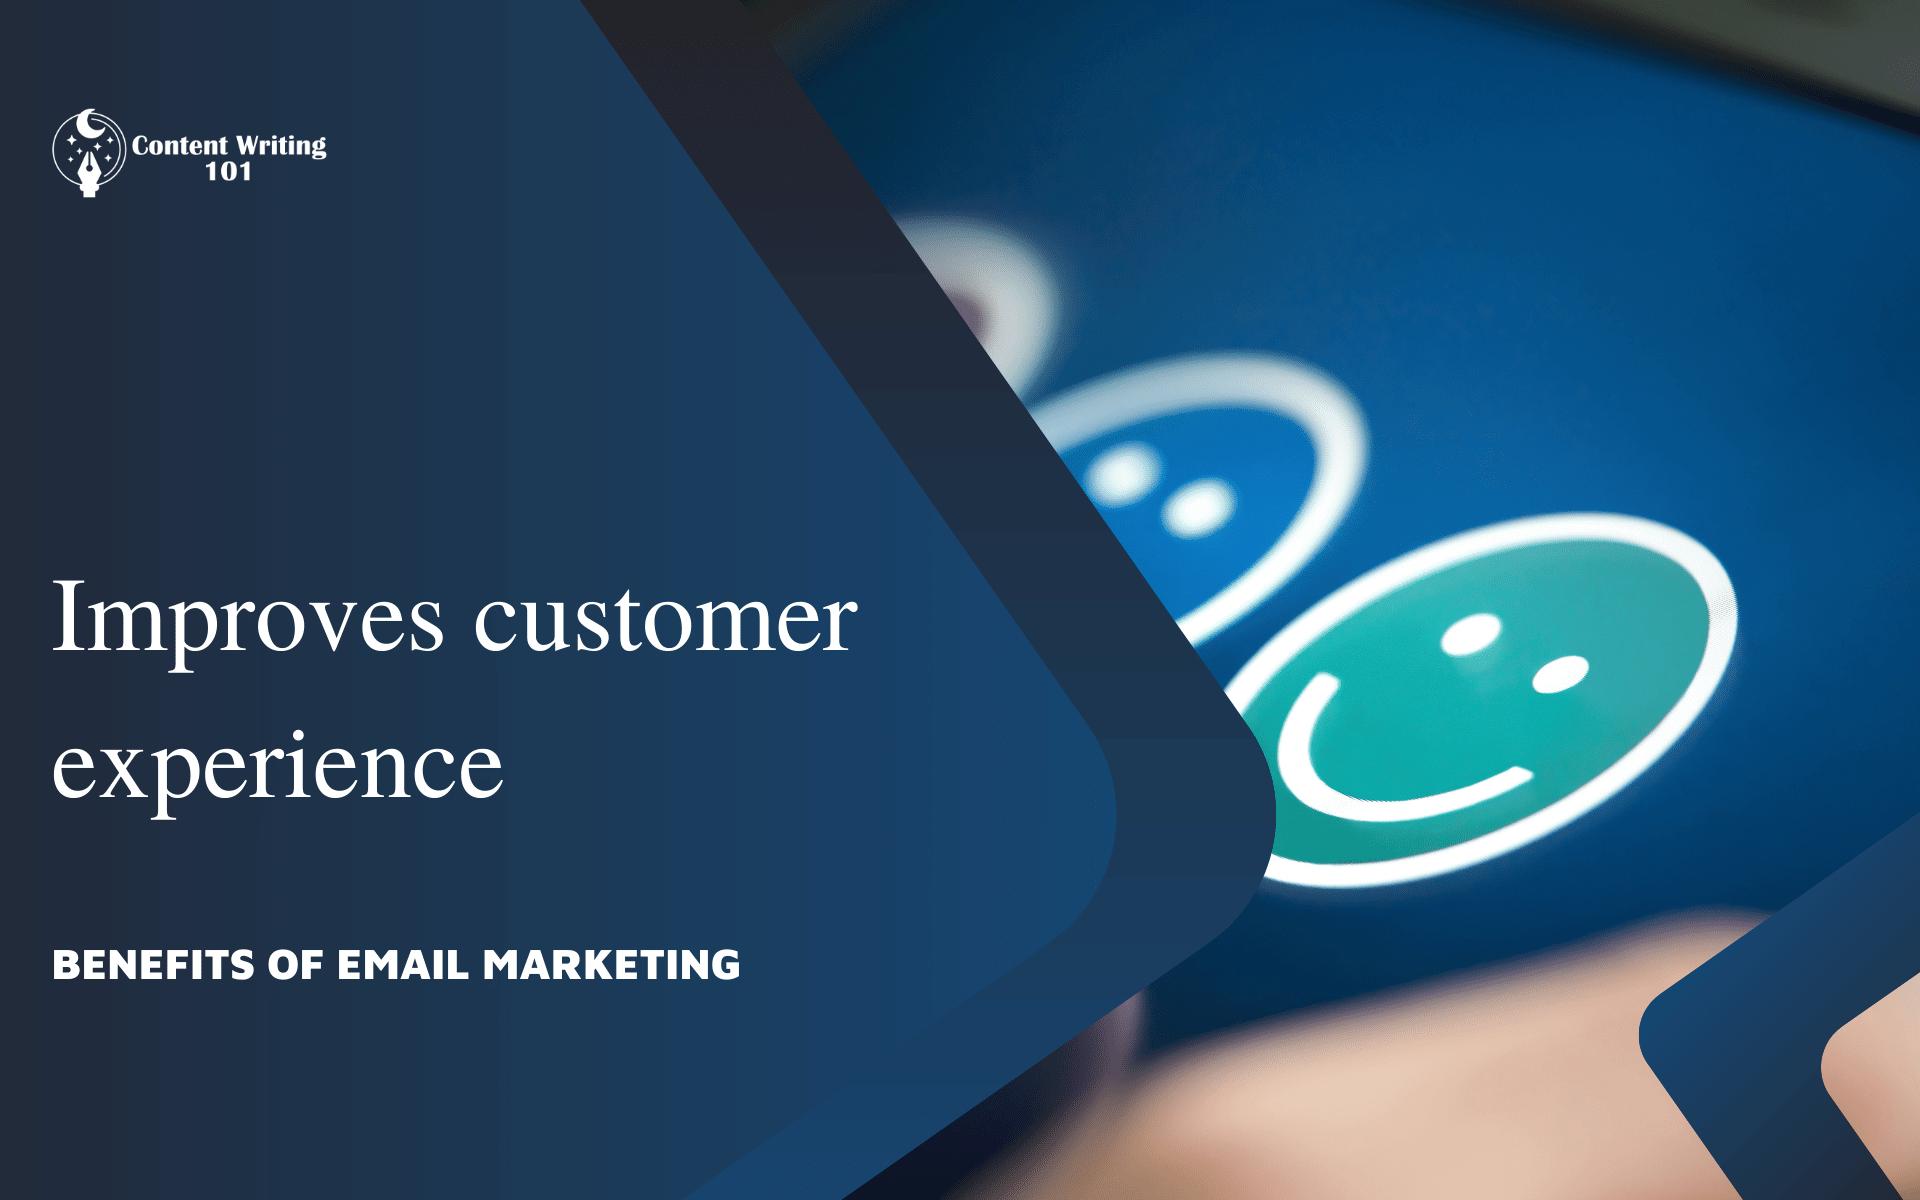 3. Improves customer experience